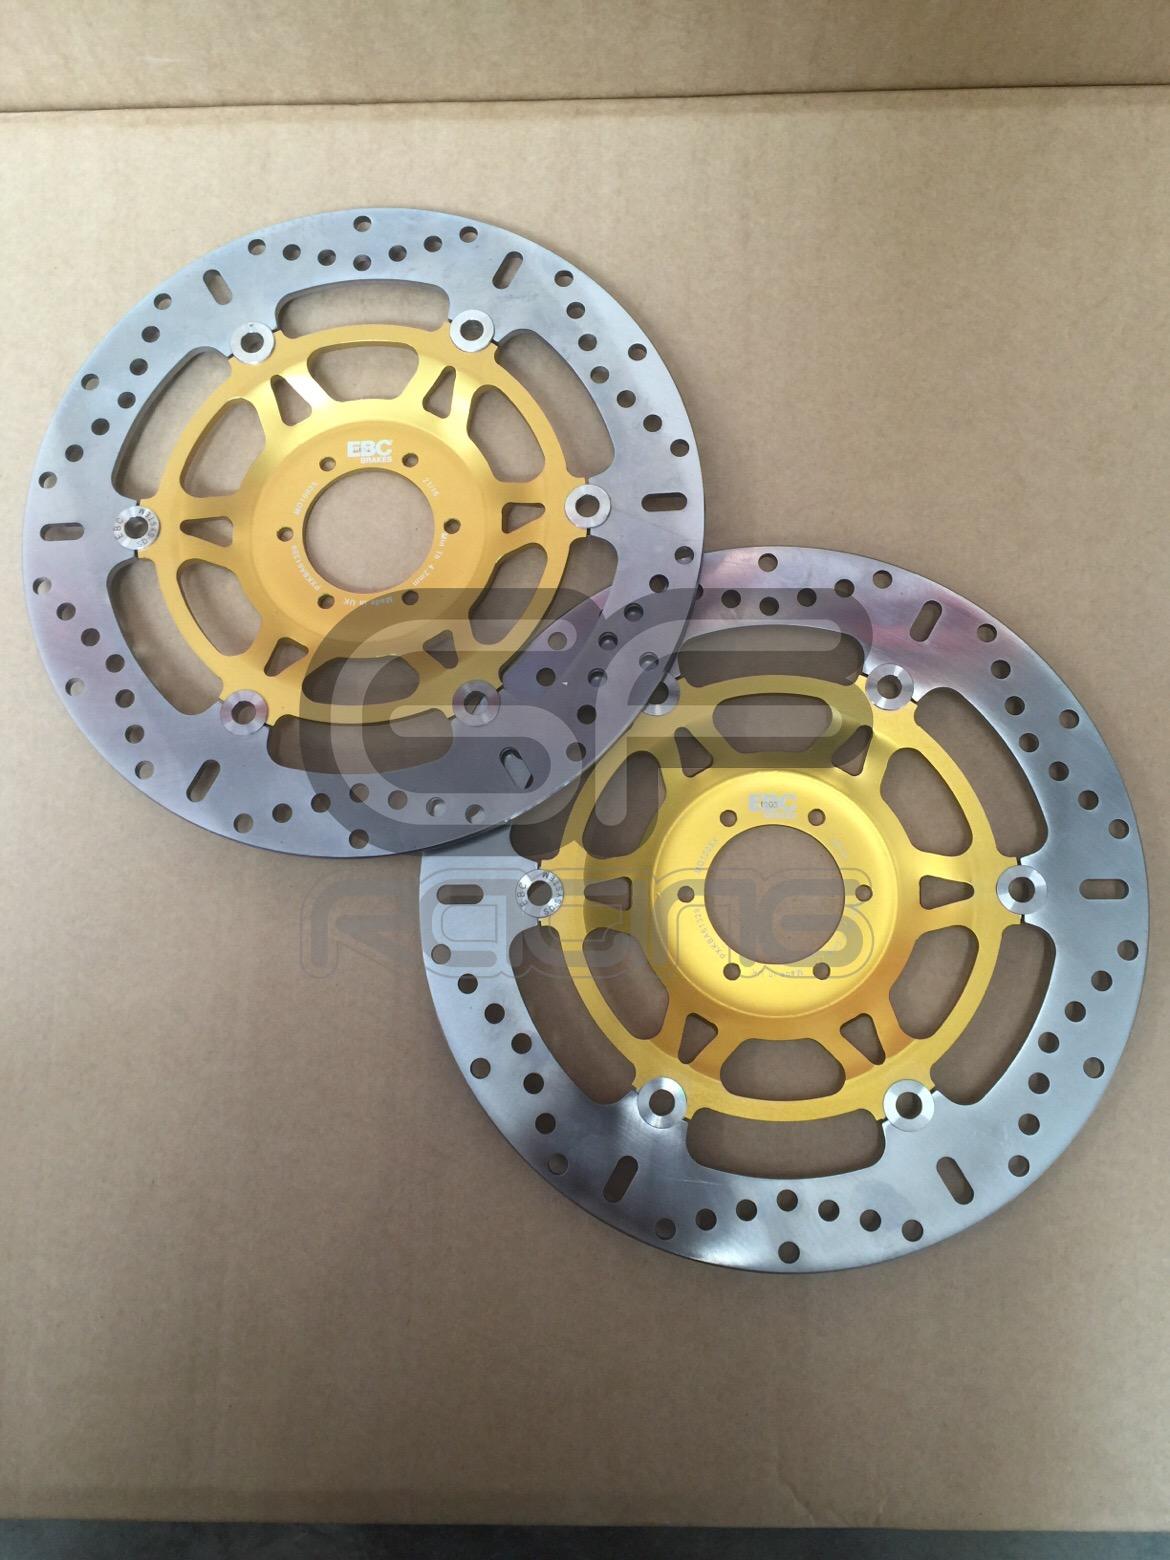 EBC Front Brake Discs CBR400 NC23 NC29 VFR400 NC30 RVF400 NC35